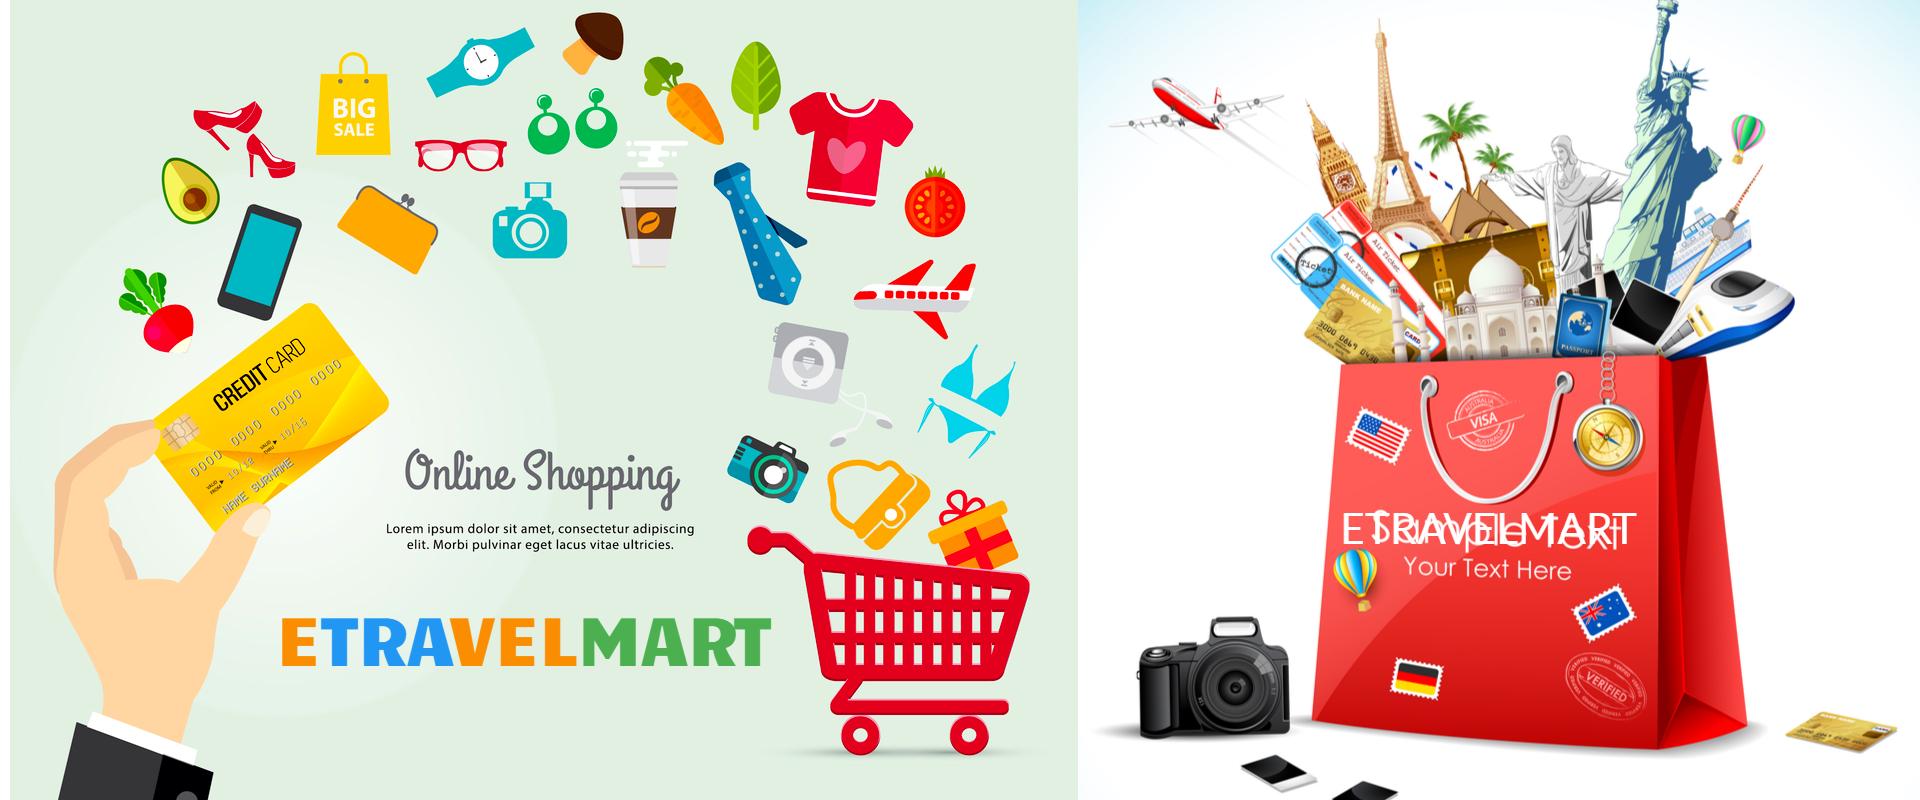 E Travel Mart |